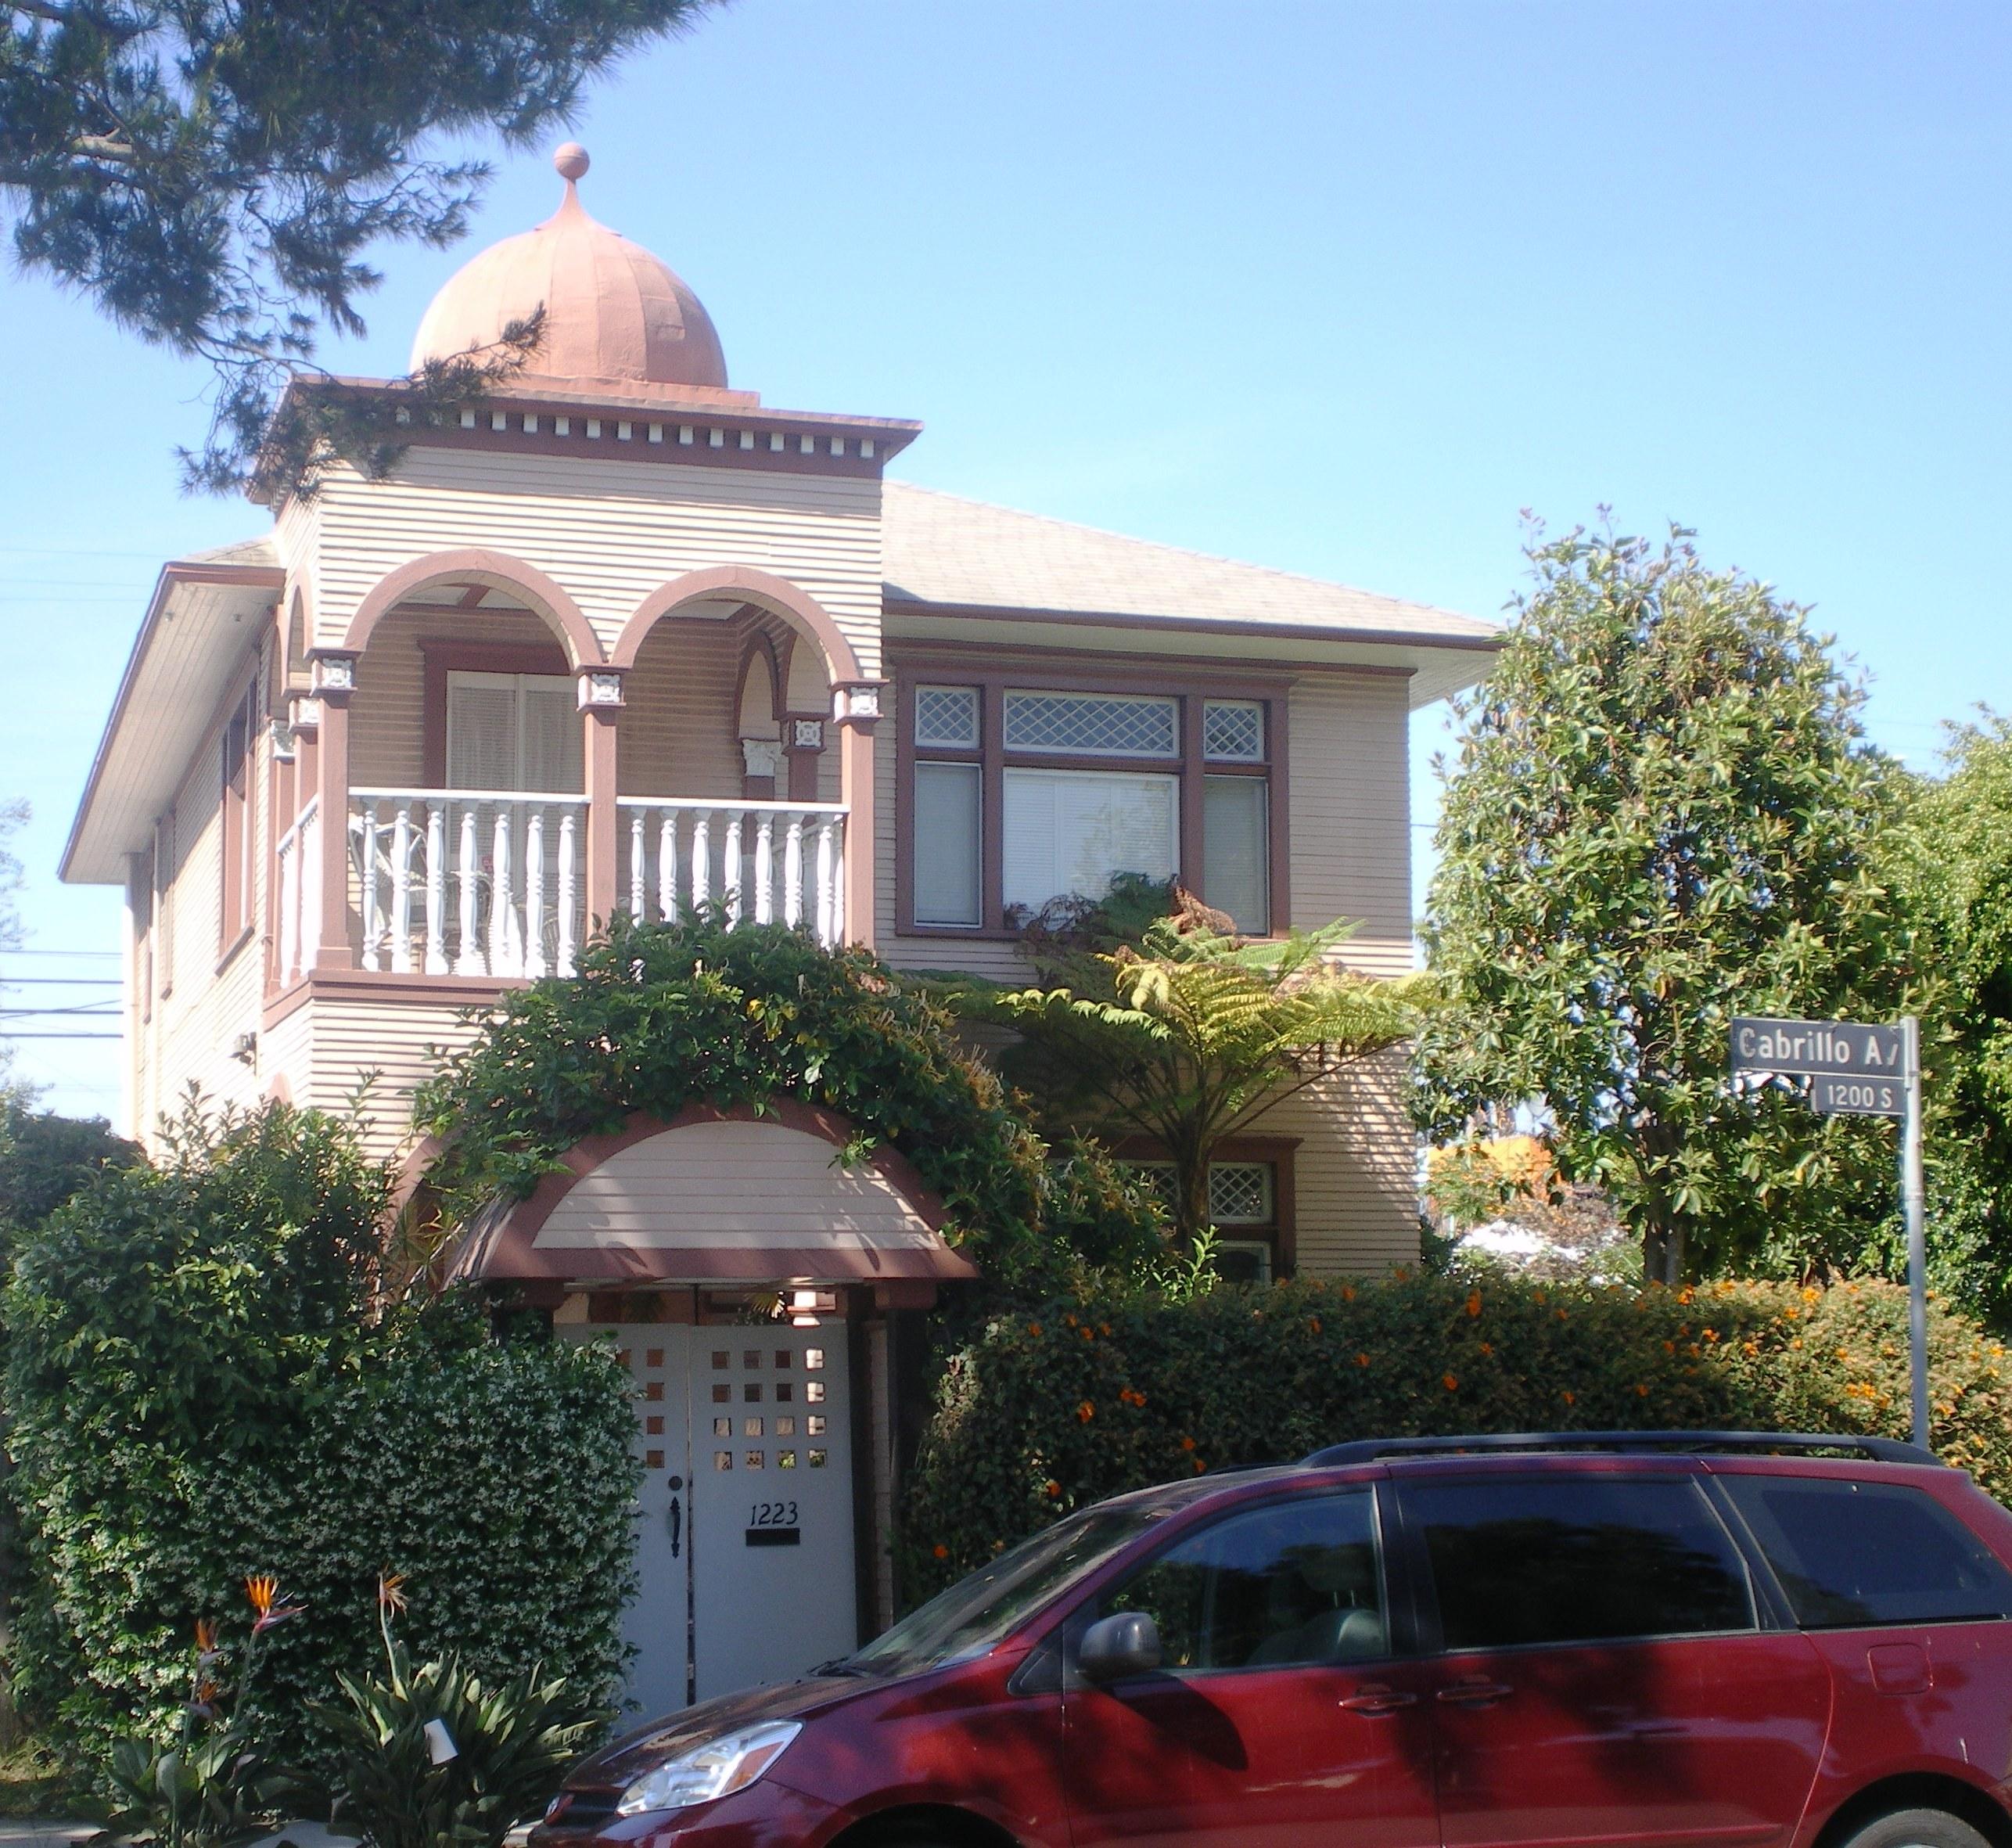 venice house manitoba - photo#3